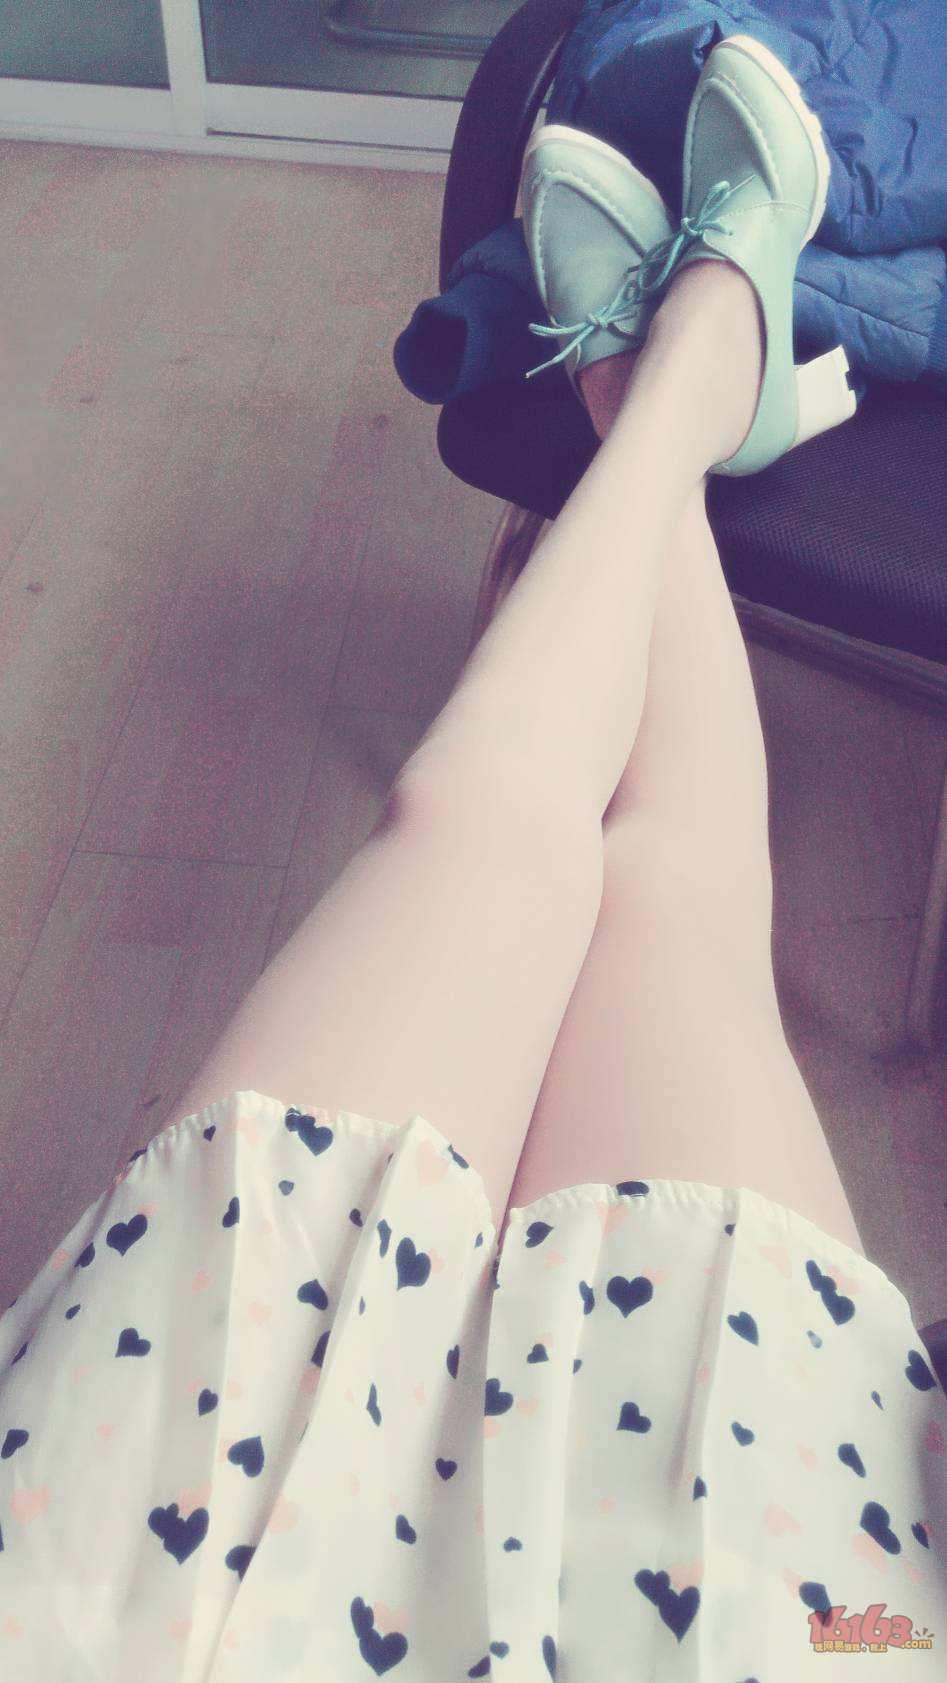 MYXJ_20150427073606_save.jpg